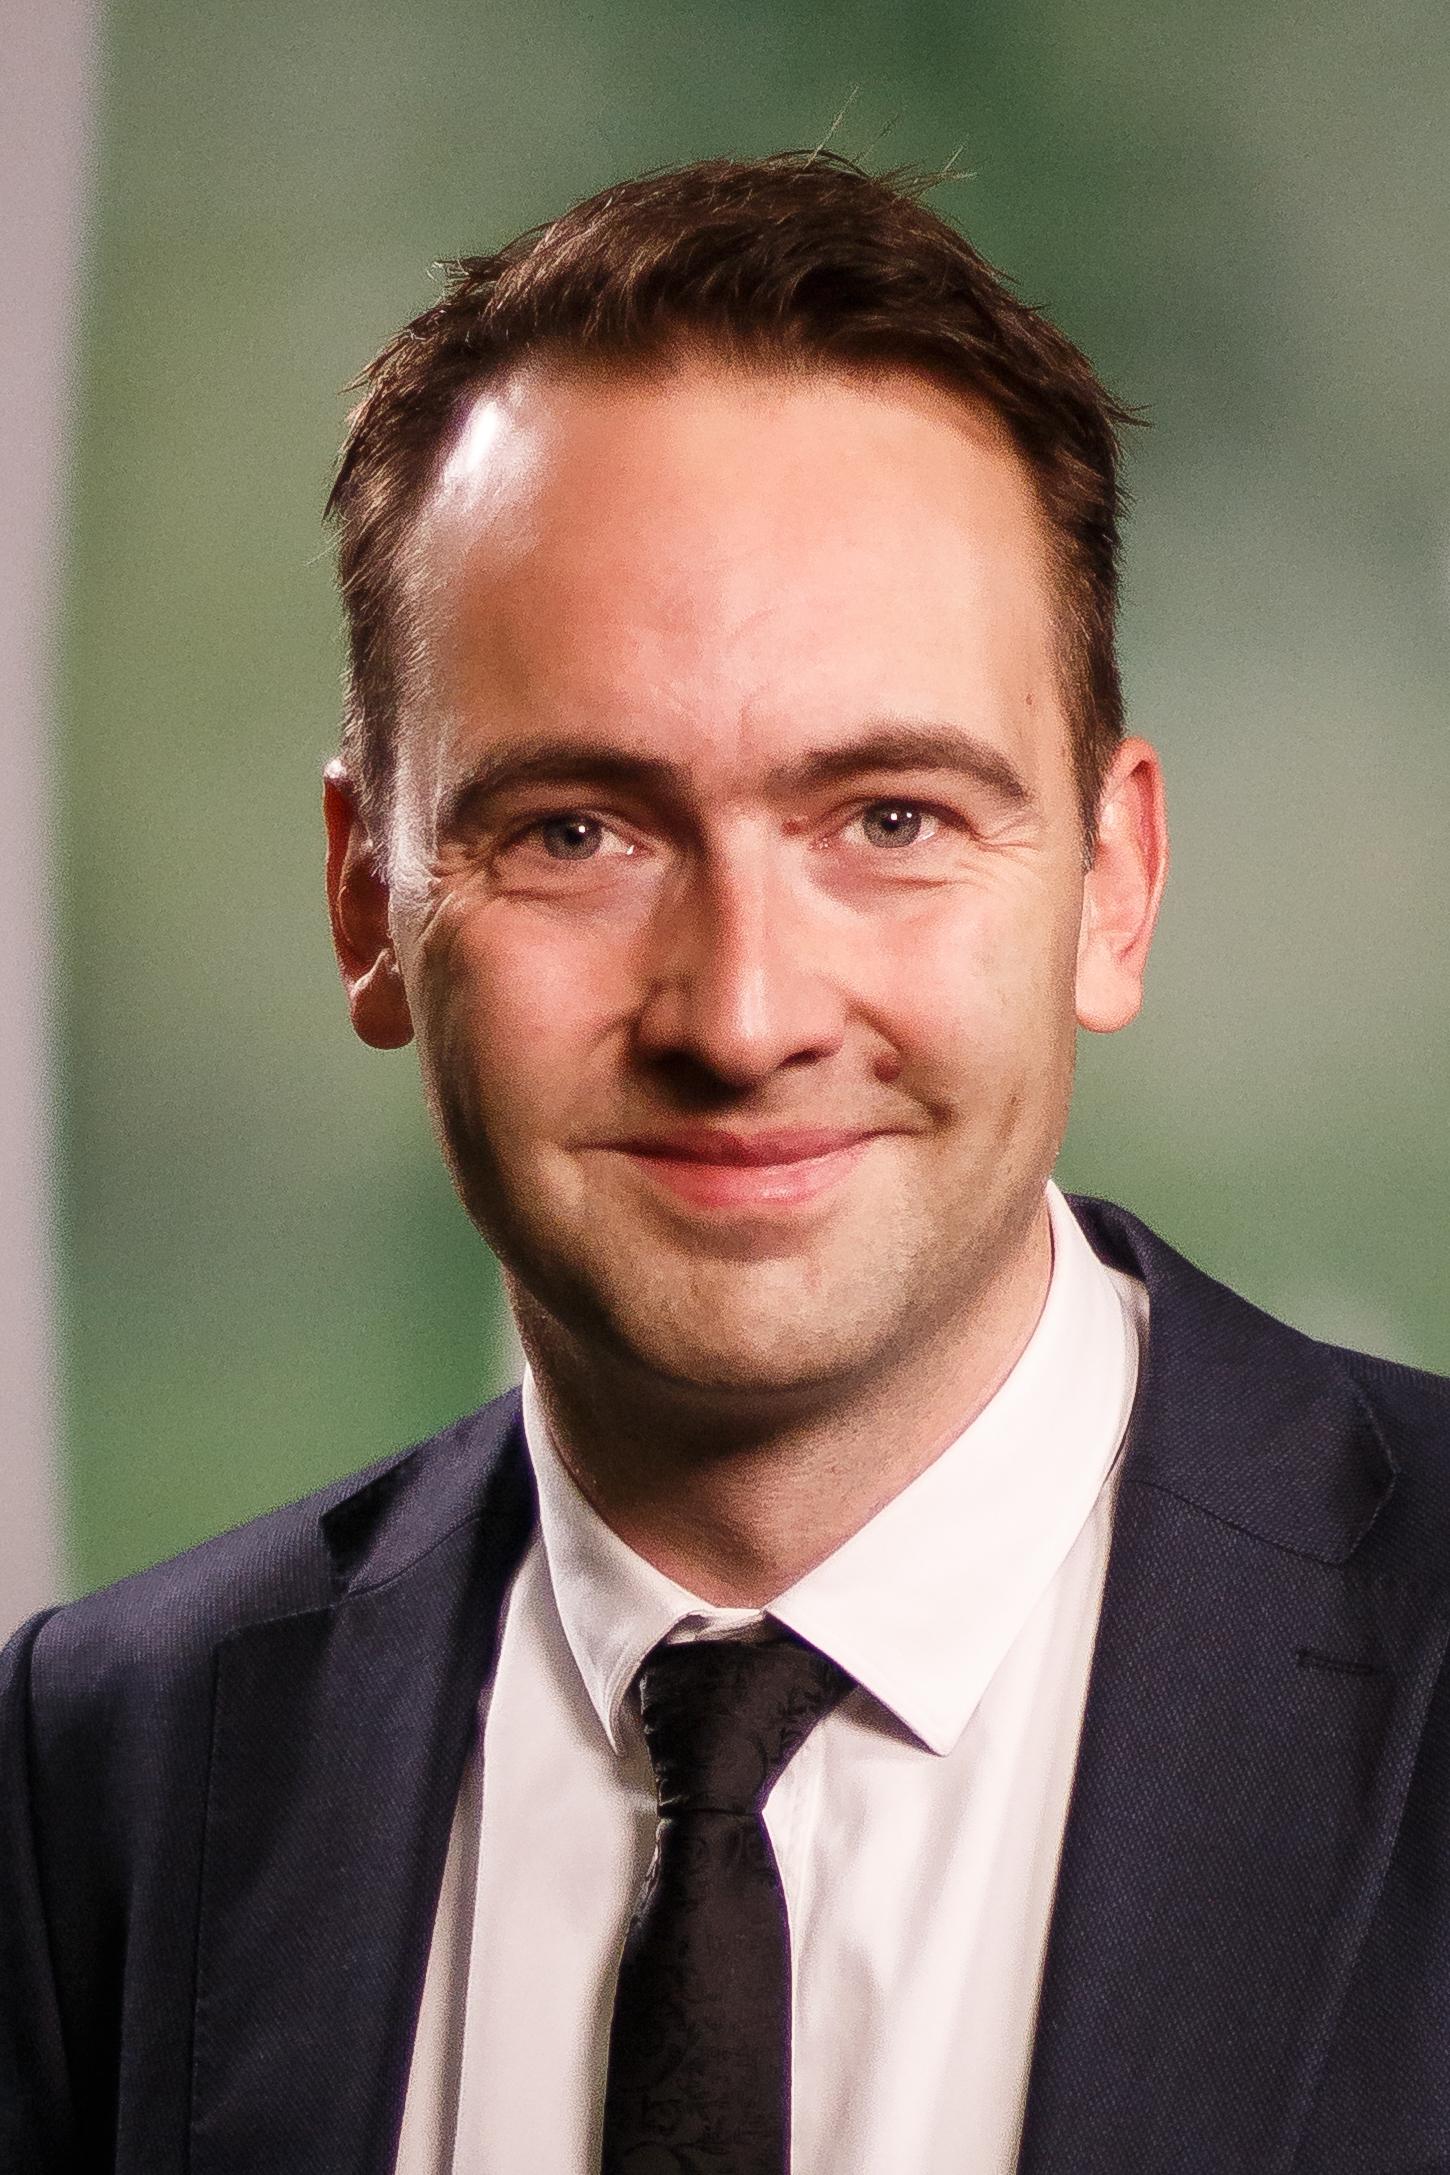 Svante Hedin